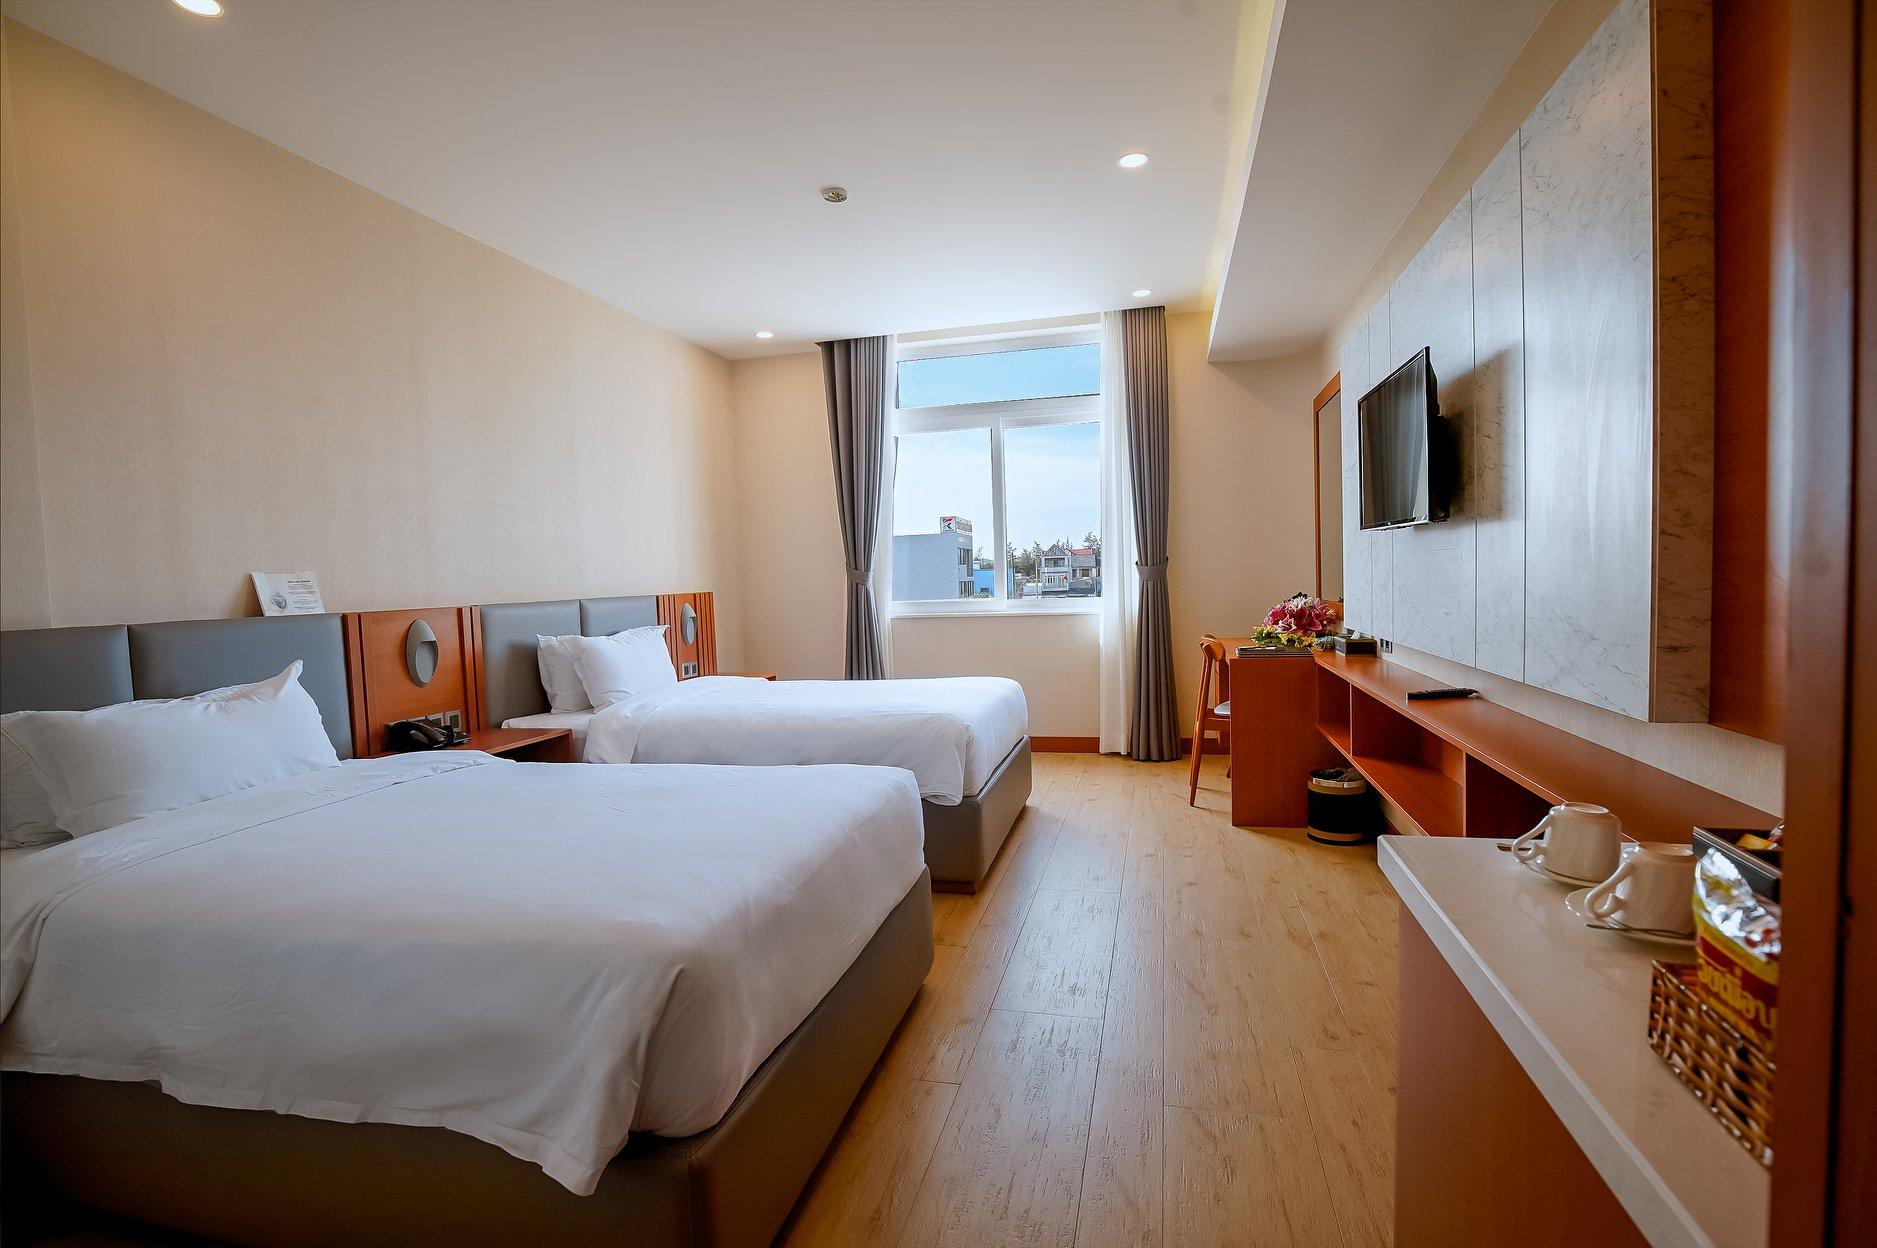 khach san gan long hai Bella Vita Hotel